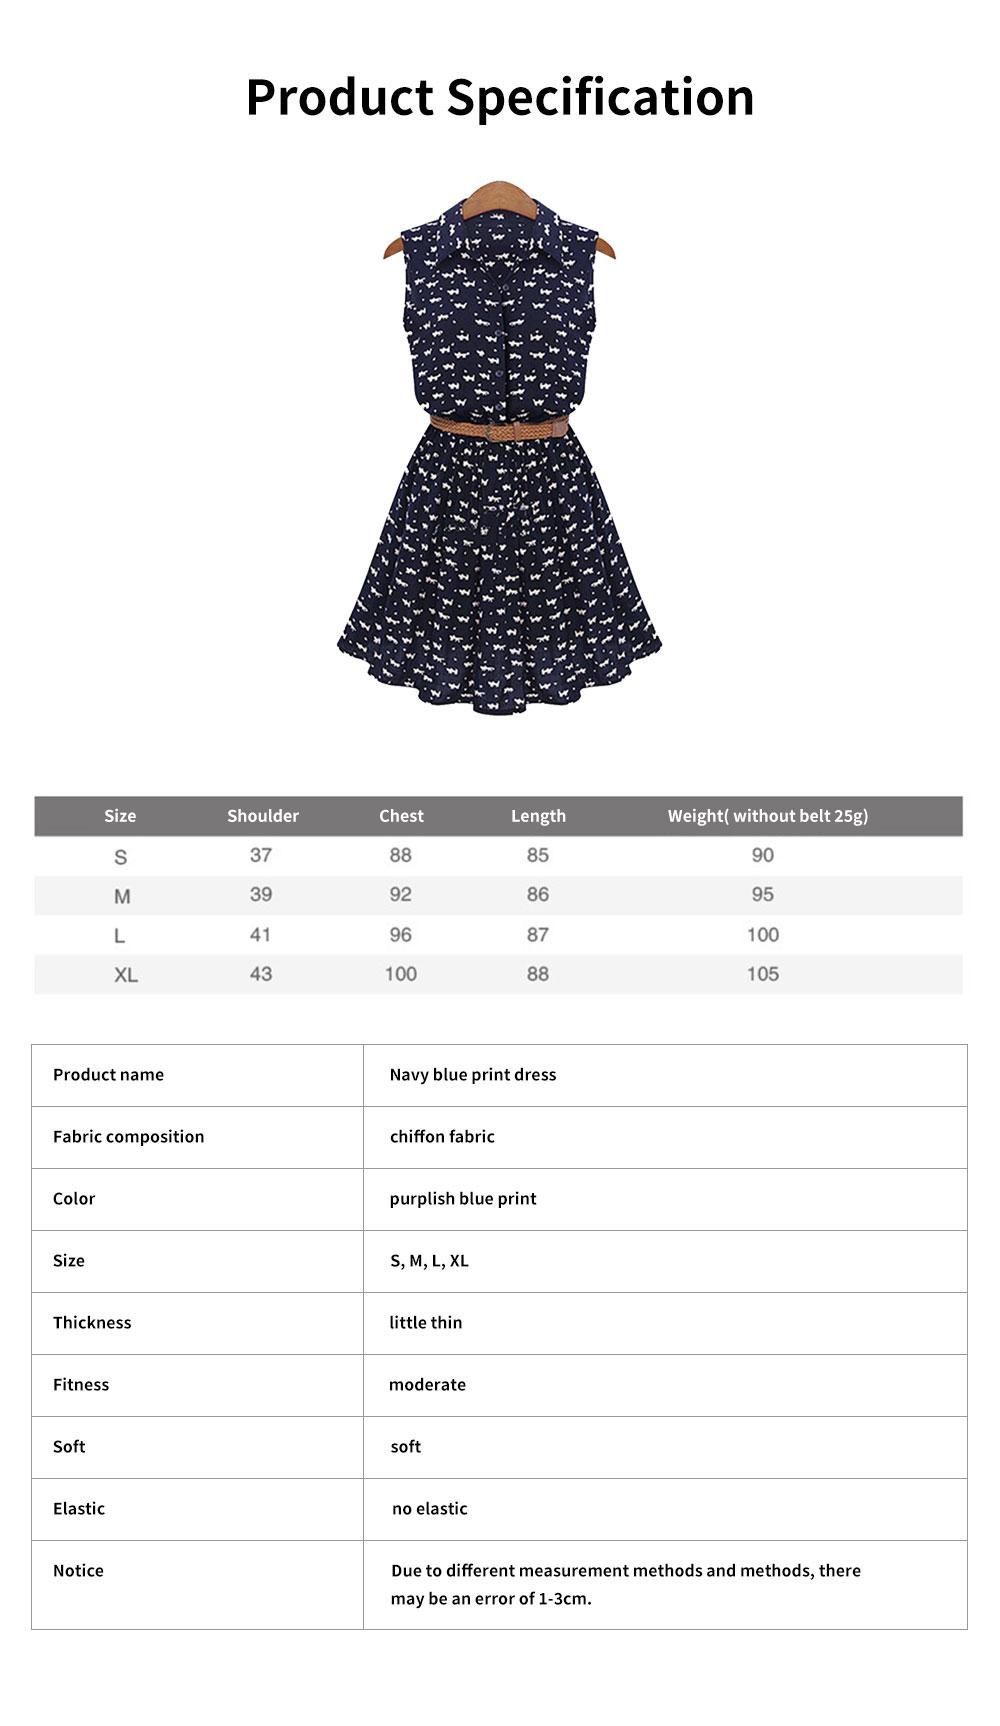 Navy Blue Print Dress for Women Lapel and Sleeveless Design Chiffon One-piece Elegant and Gorgeous Dress 6